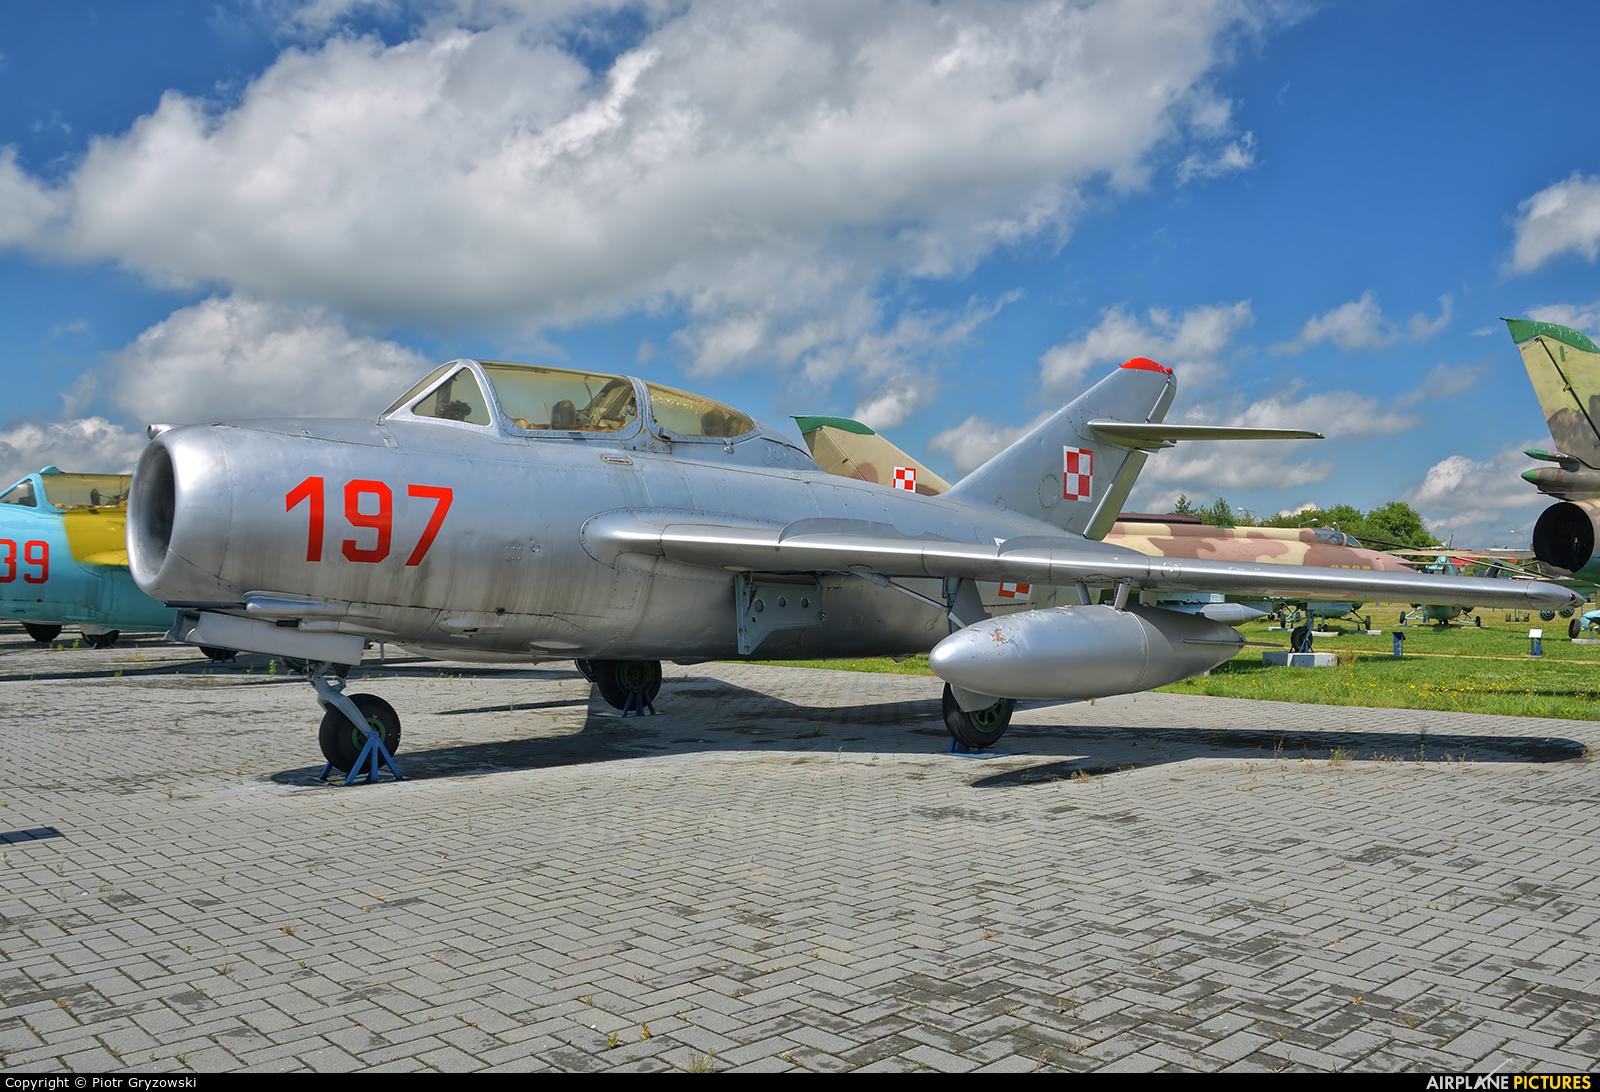 Poland - Air Force 197 aircraft at Dęblin - Museum of Polish Air Force